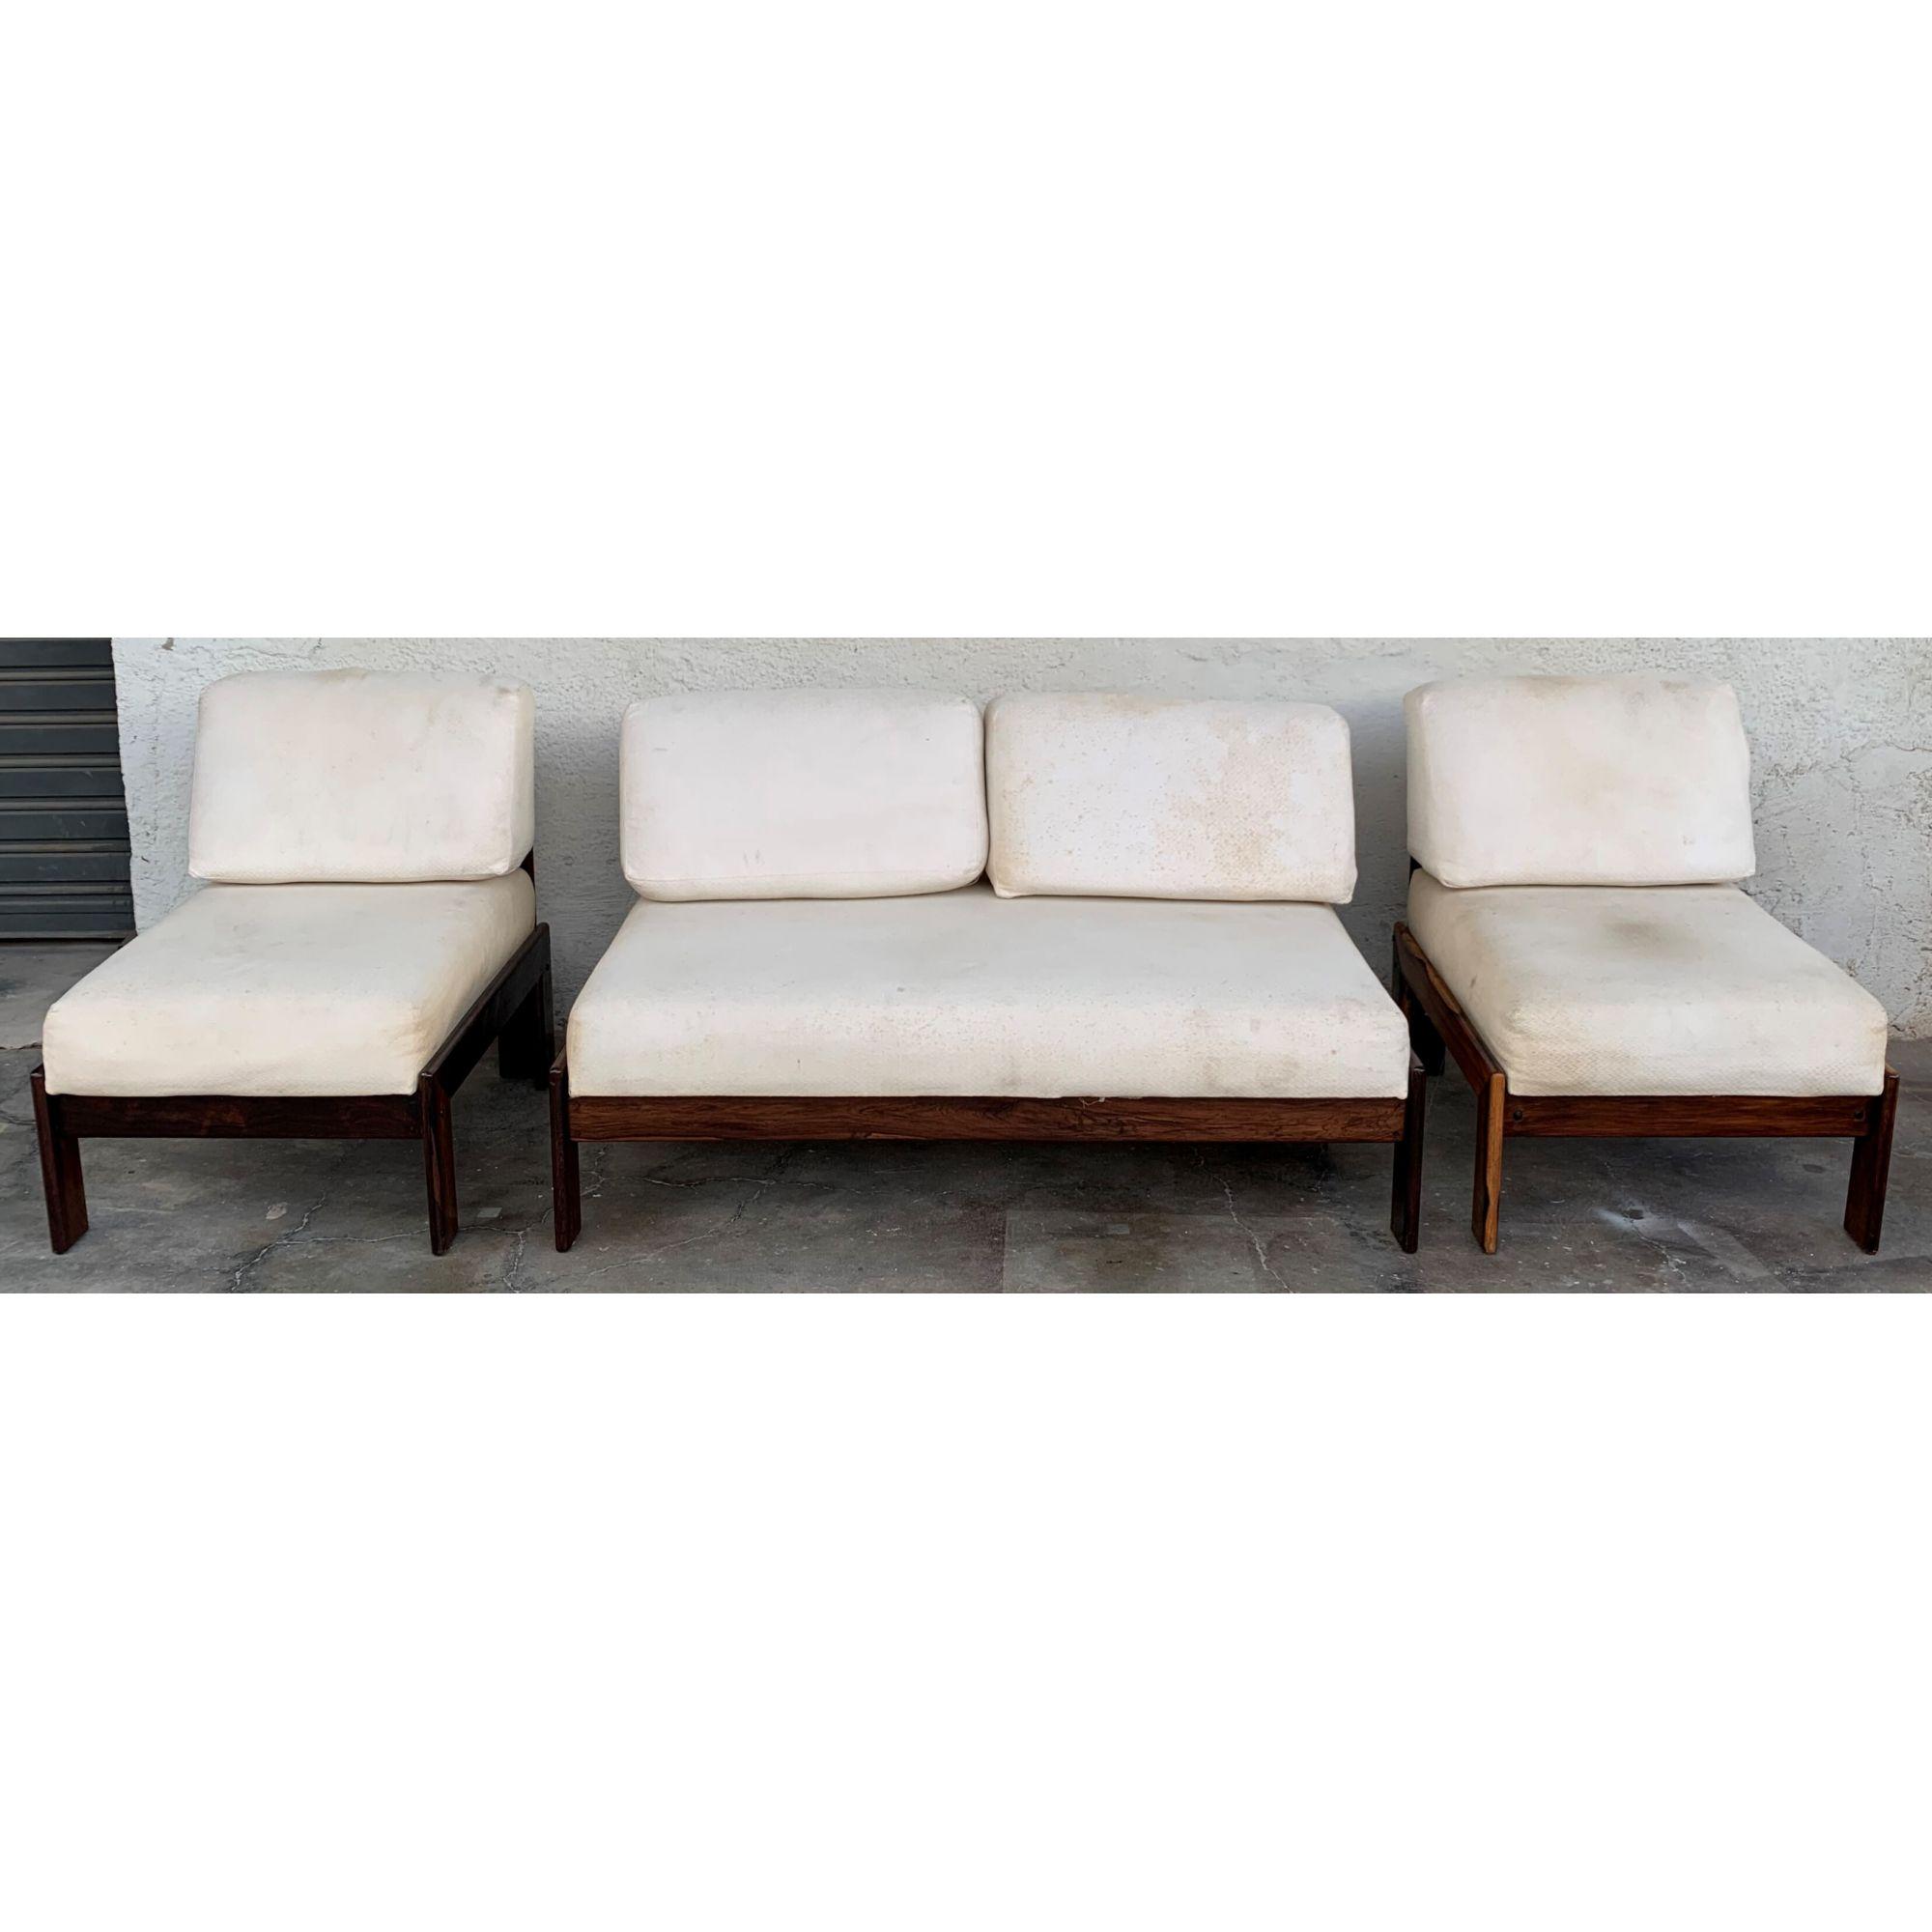 Antigo Conjunto Sofa E Poltronas Jacaranda Design Anos 60 Imperio Dos Antigos Loja De Moveis E Objetos De Decoracao Antigos